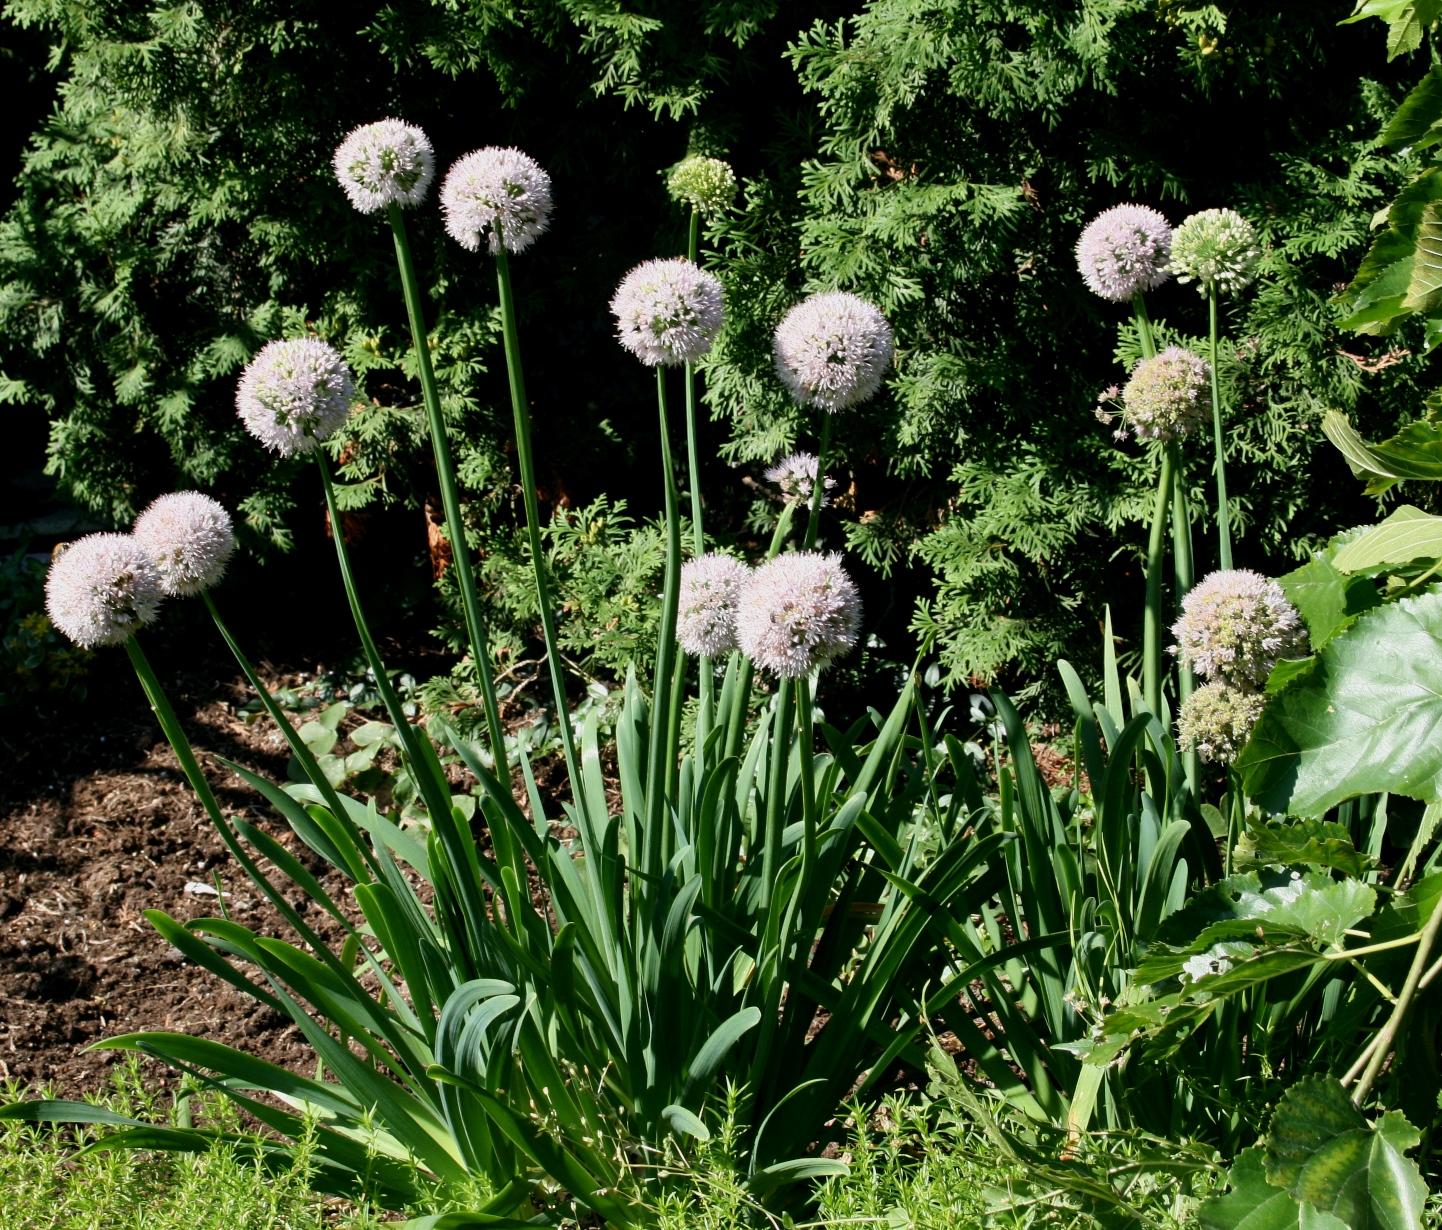 Czosnek Ogrodowy (Allium)